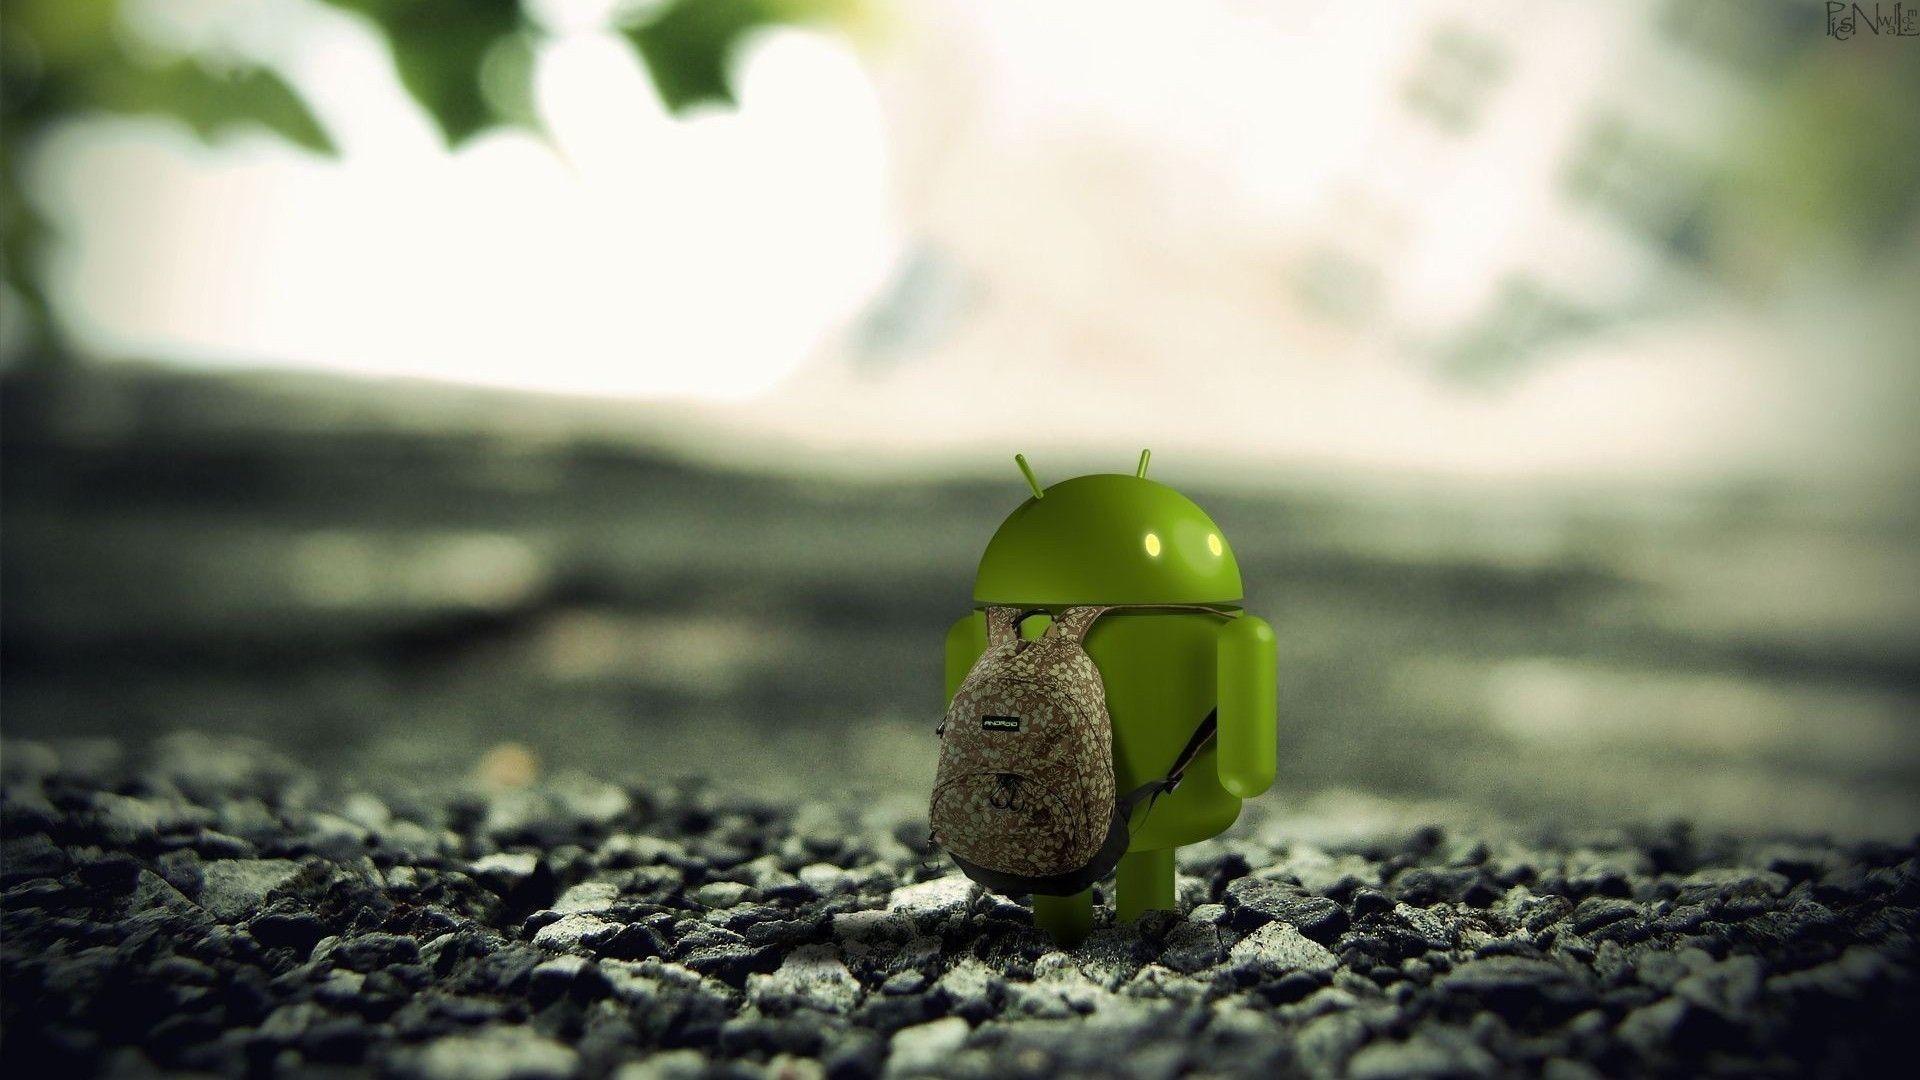 1920x1080 0 Amazing Mobile Android Wallpapers Hd Desktop Download 1920x1200 Grazz